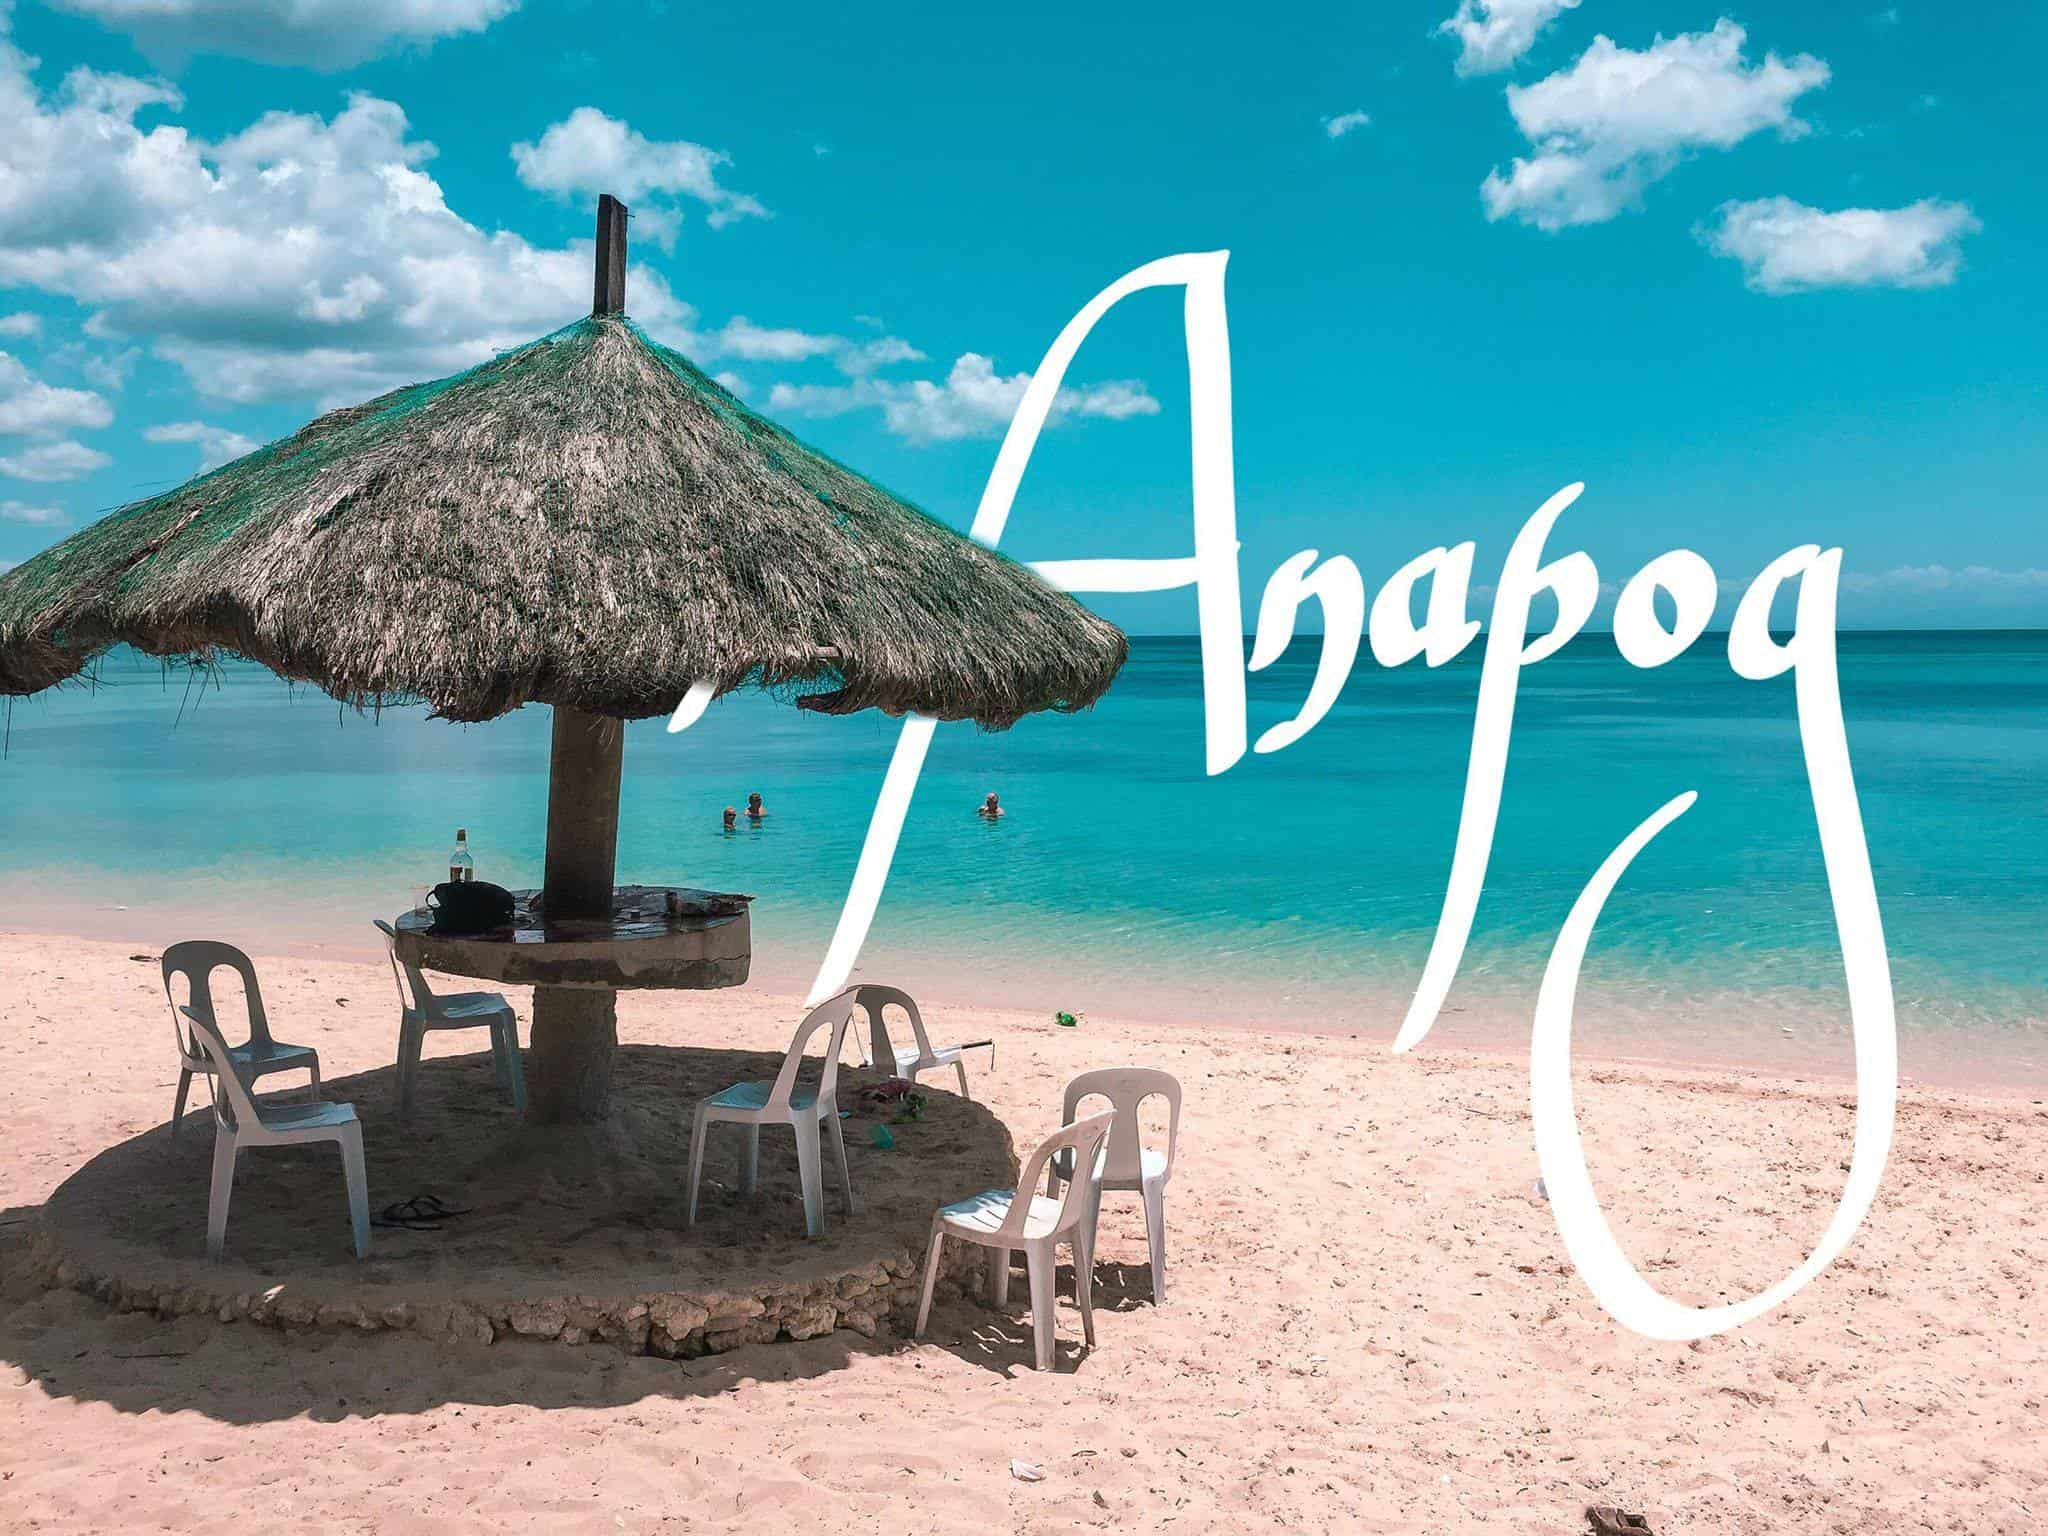 Orongan Beach Resort: The 50-Peso haven in Anapog, San